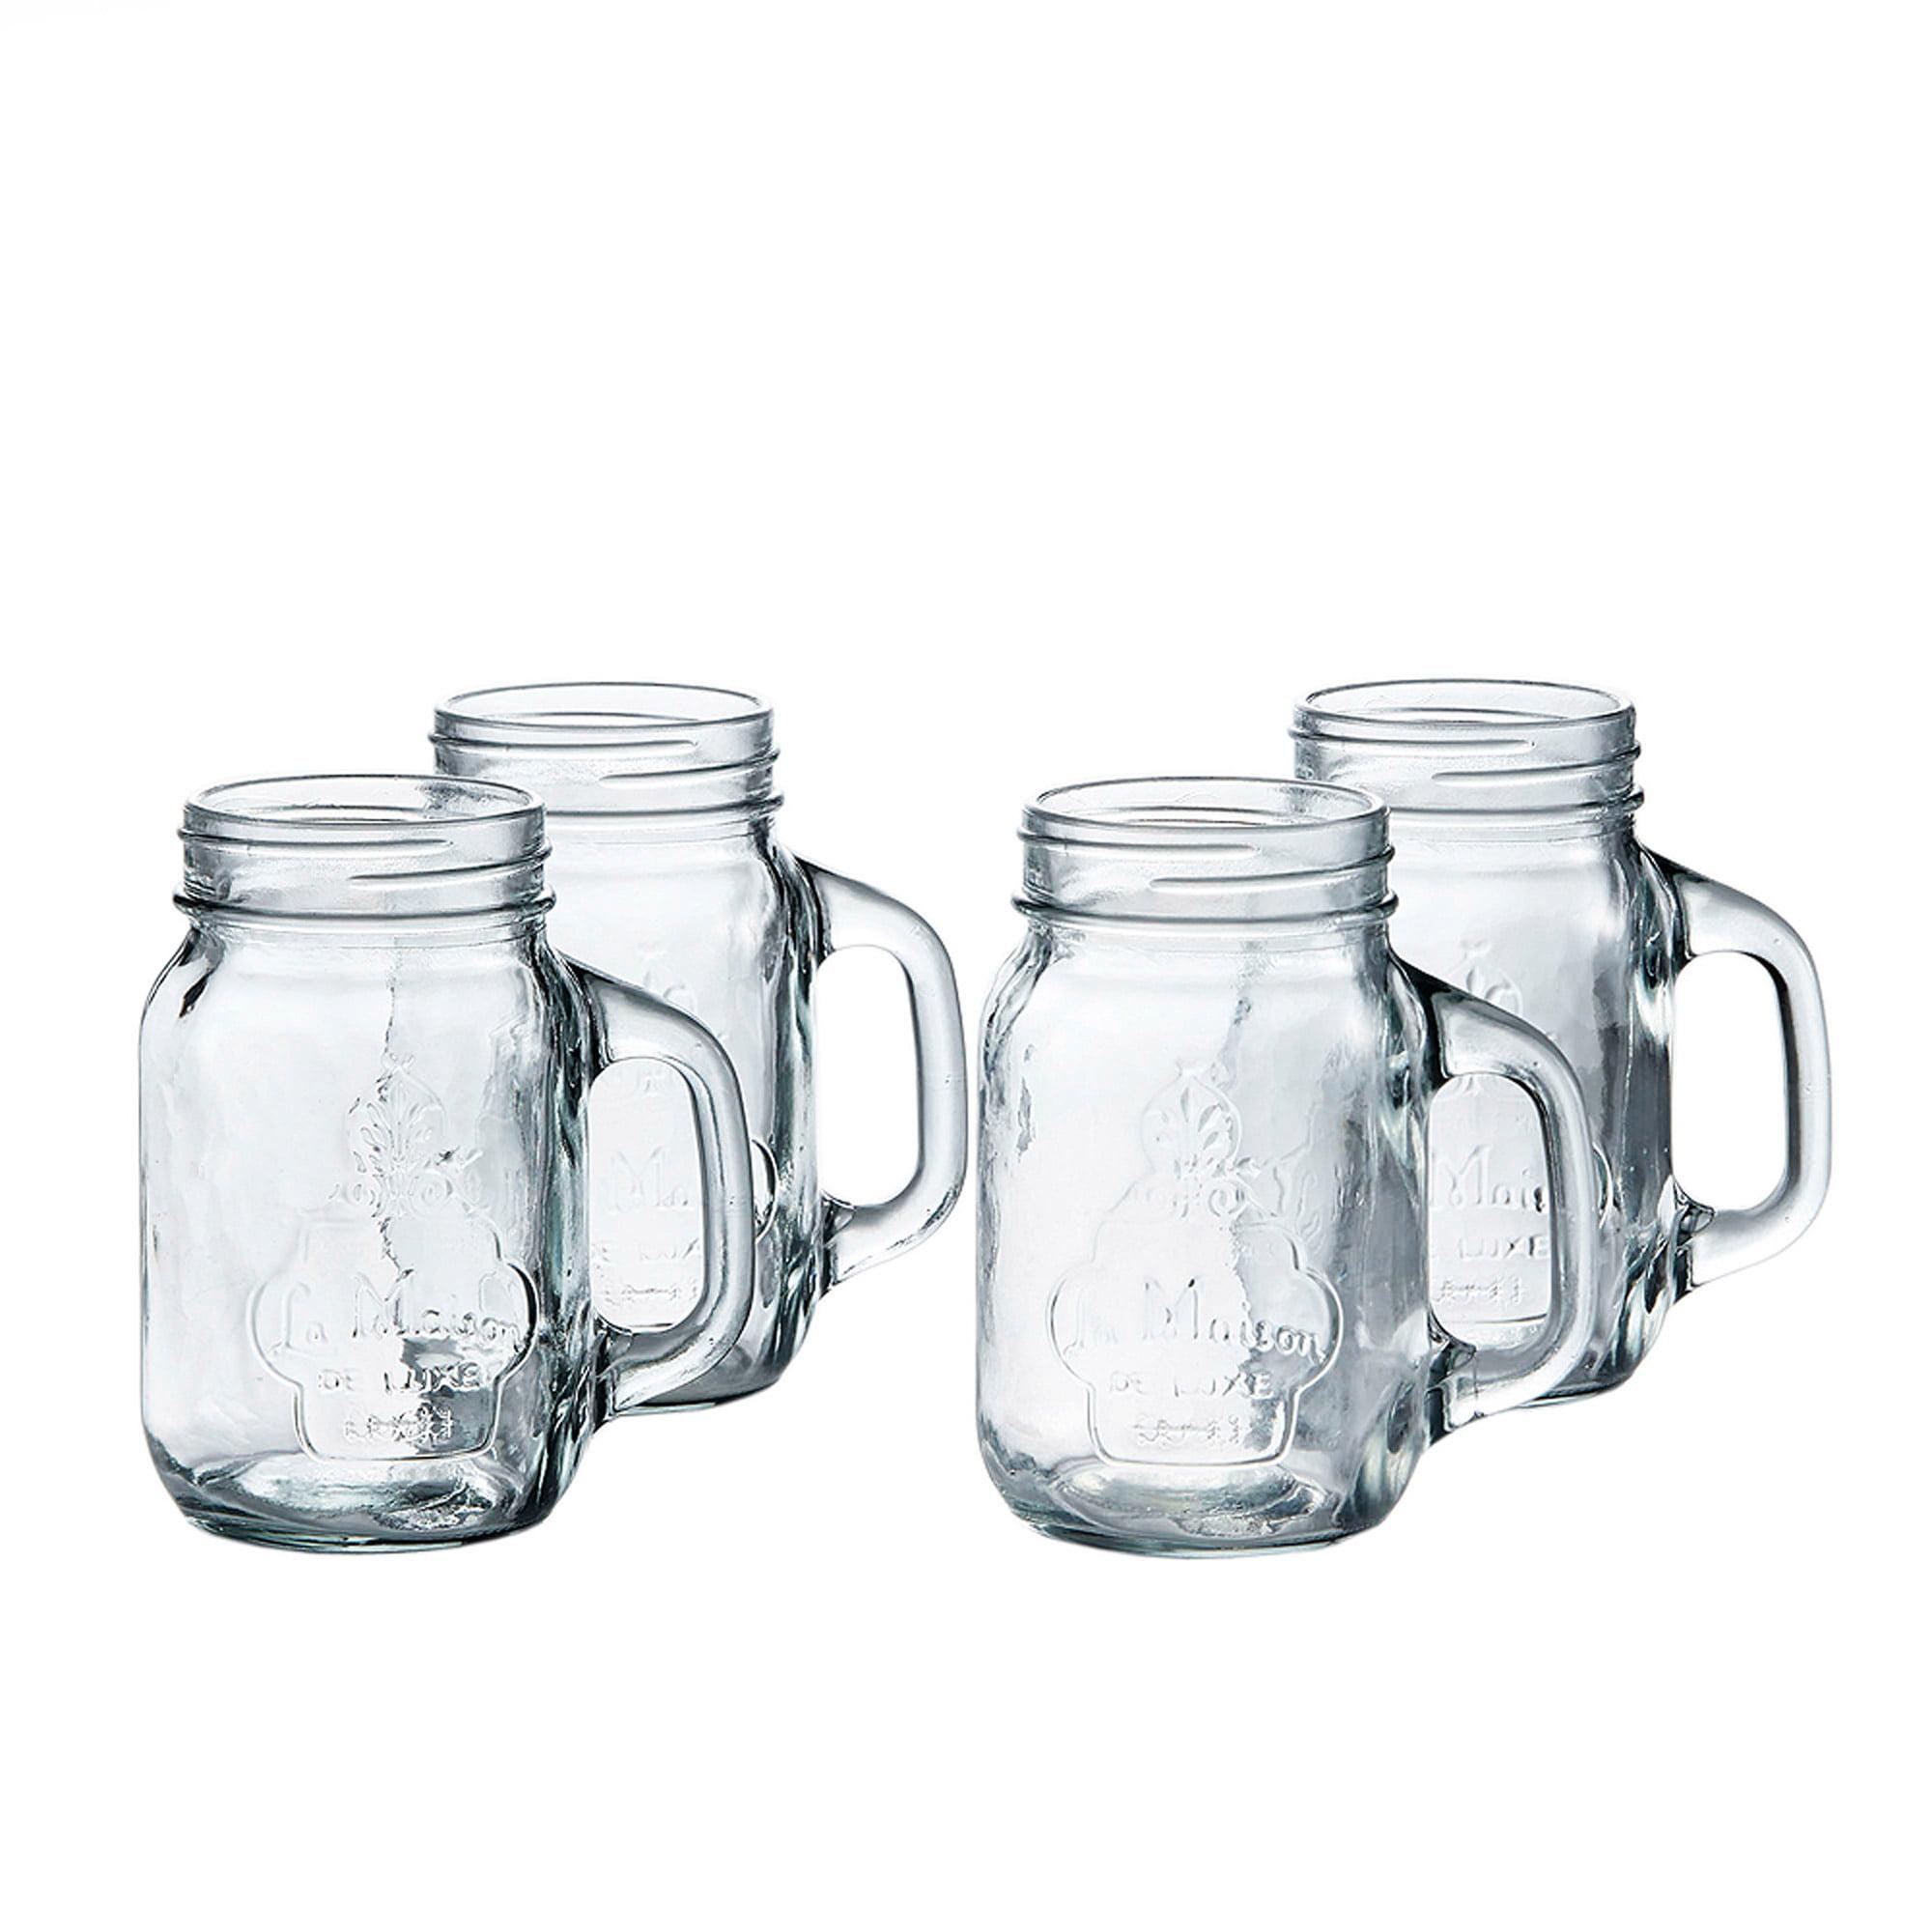 "Style Setter La Maison Set Of 4 Mason Jars, 3.9"" X 3.15"" X 5.3""H, 16 Oz"